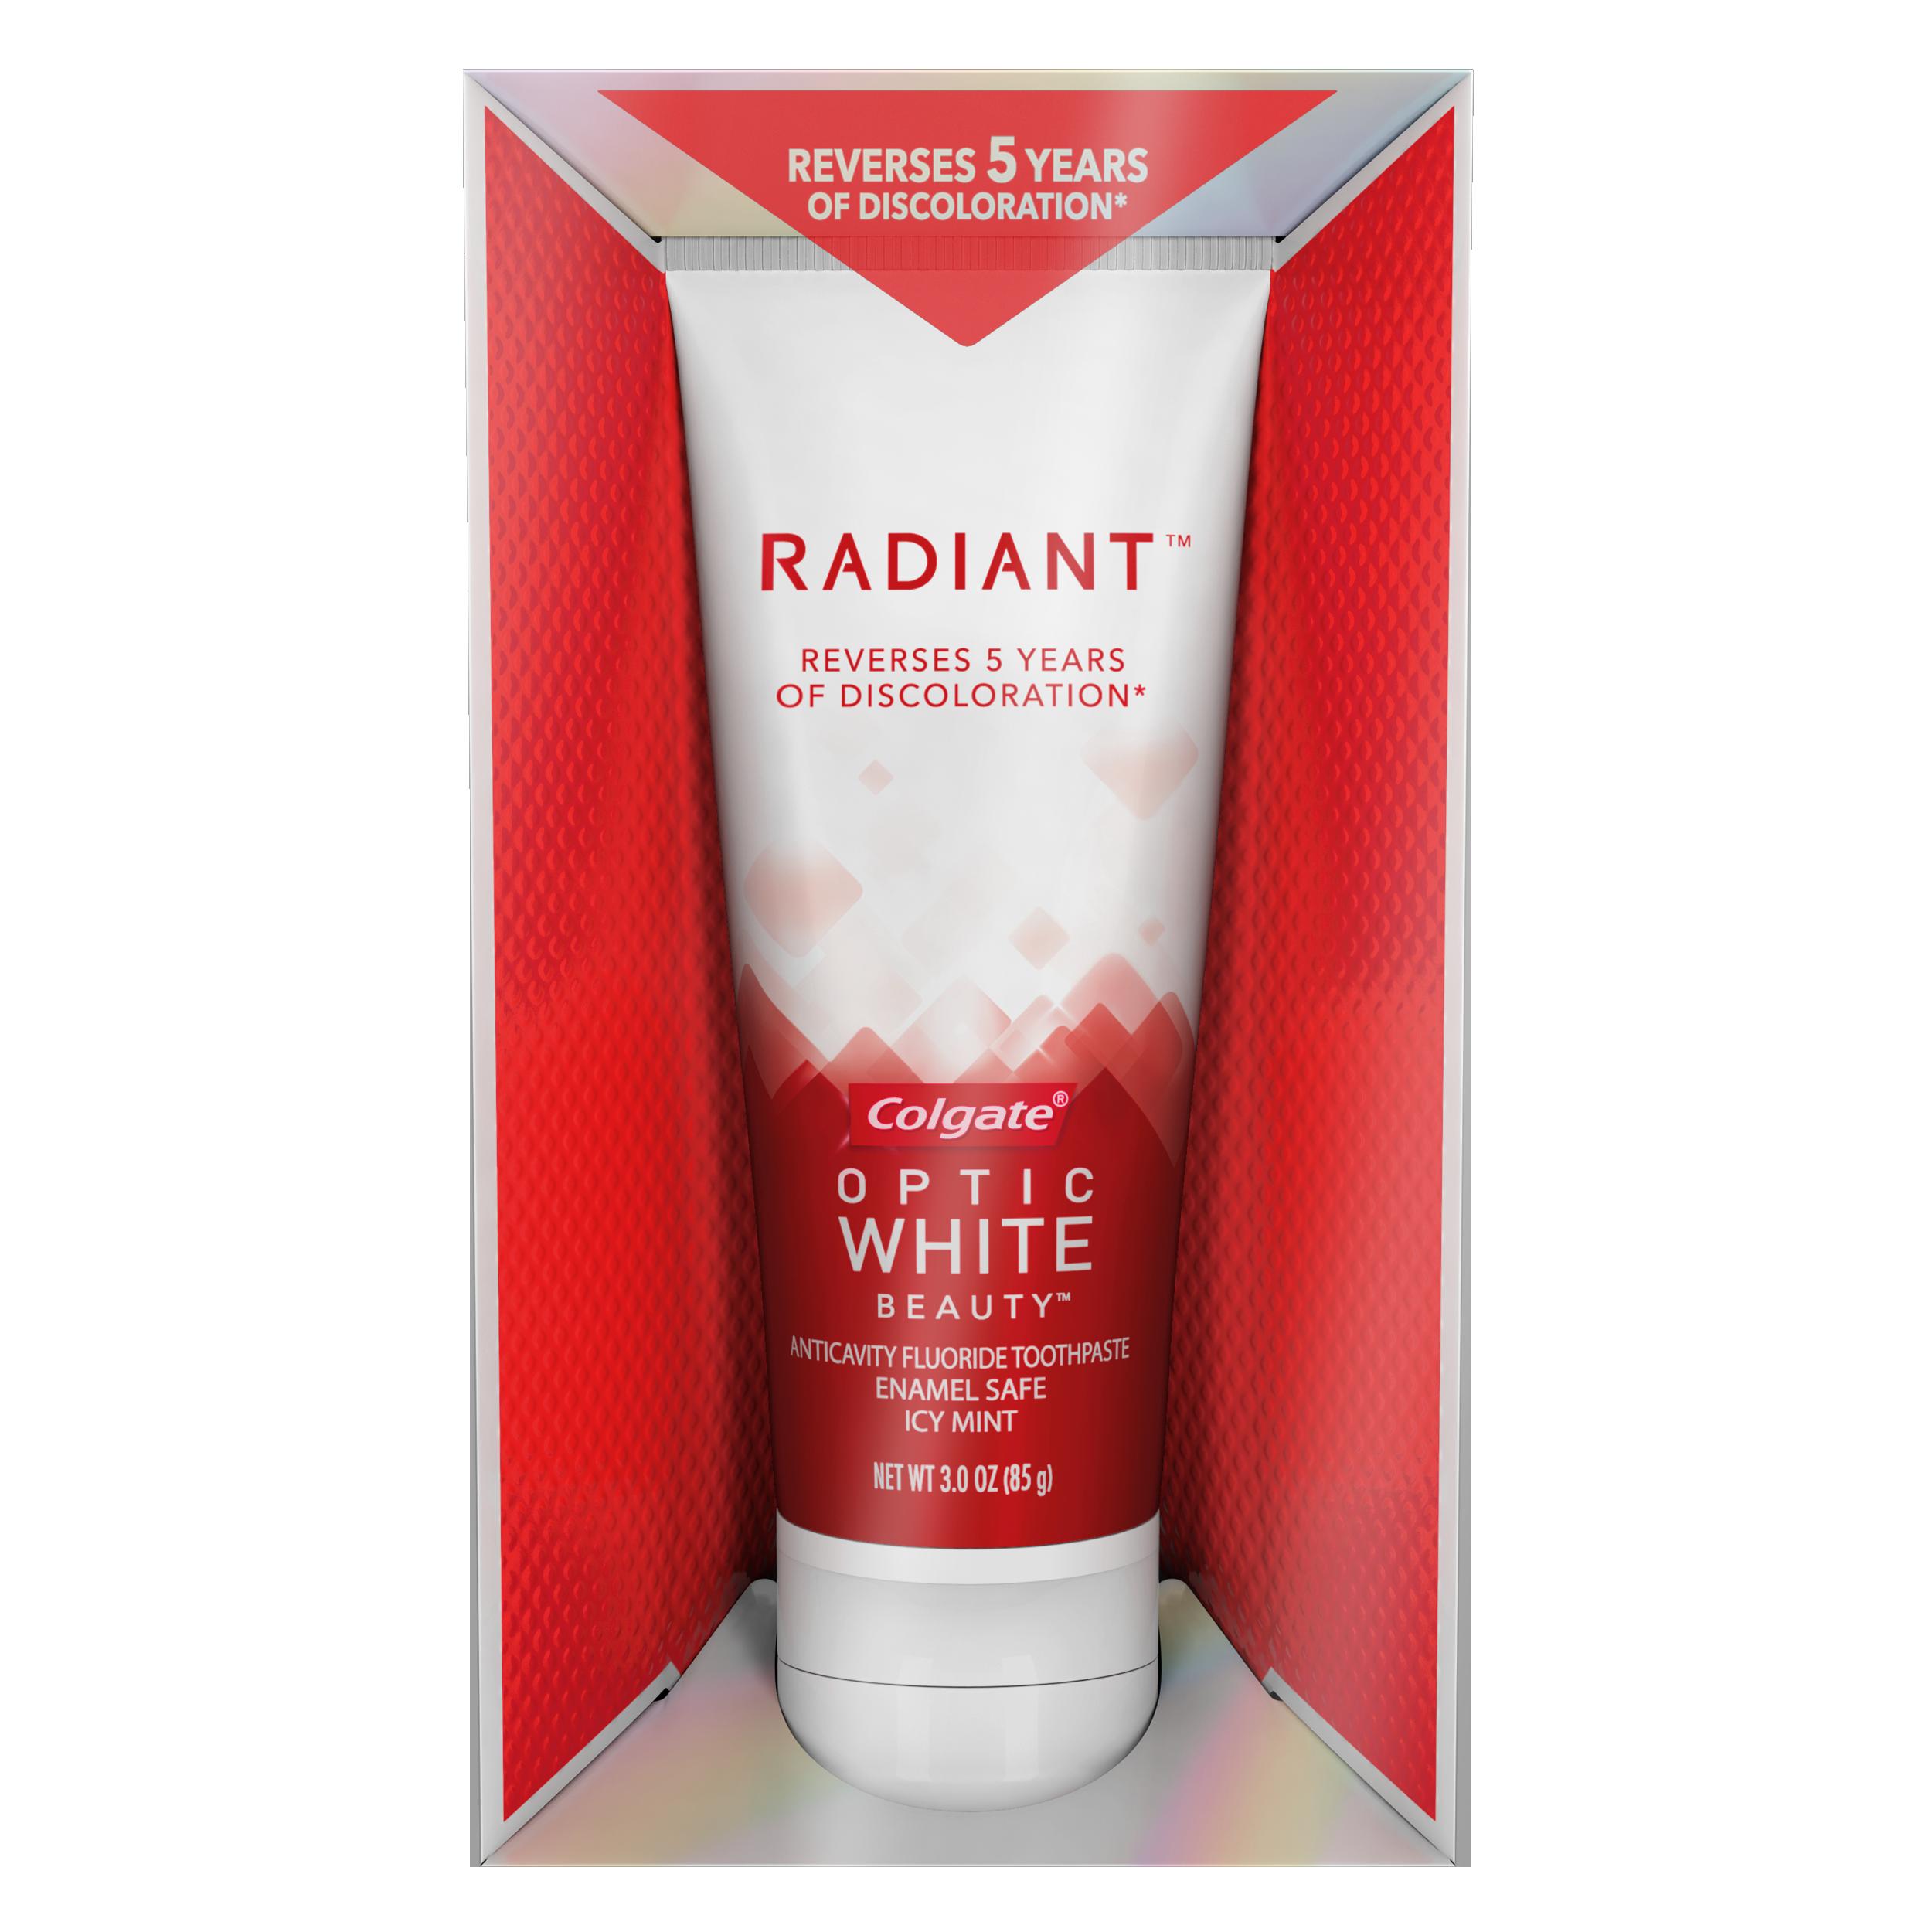 Colgate Optic White Beauty Radiant Whitening Toothpaste, 3 Oz